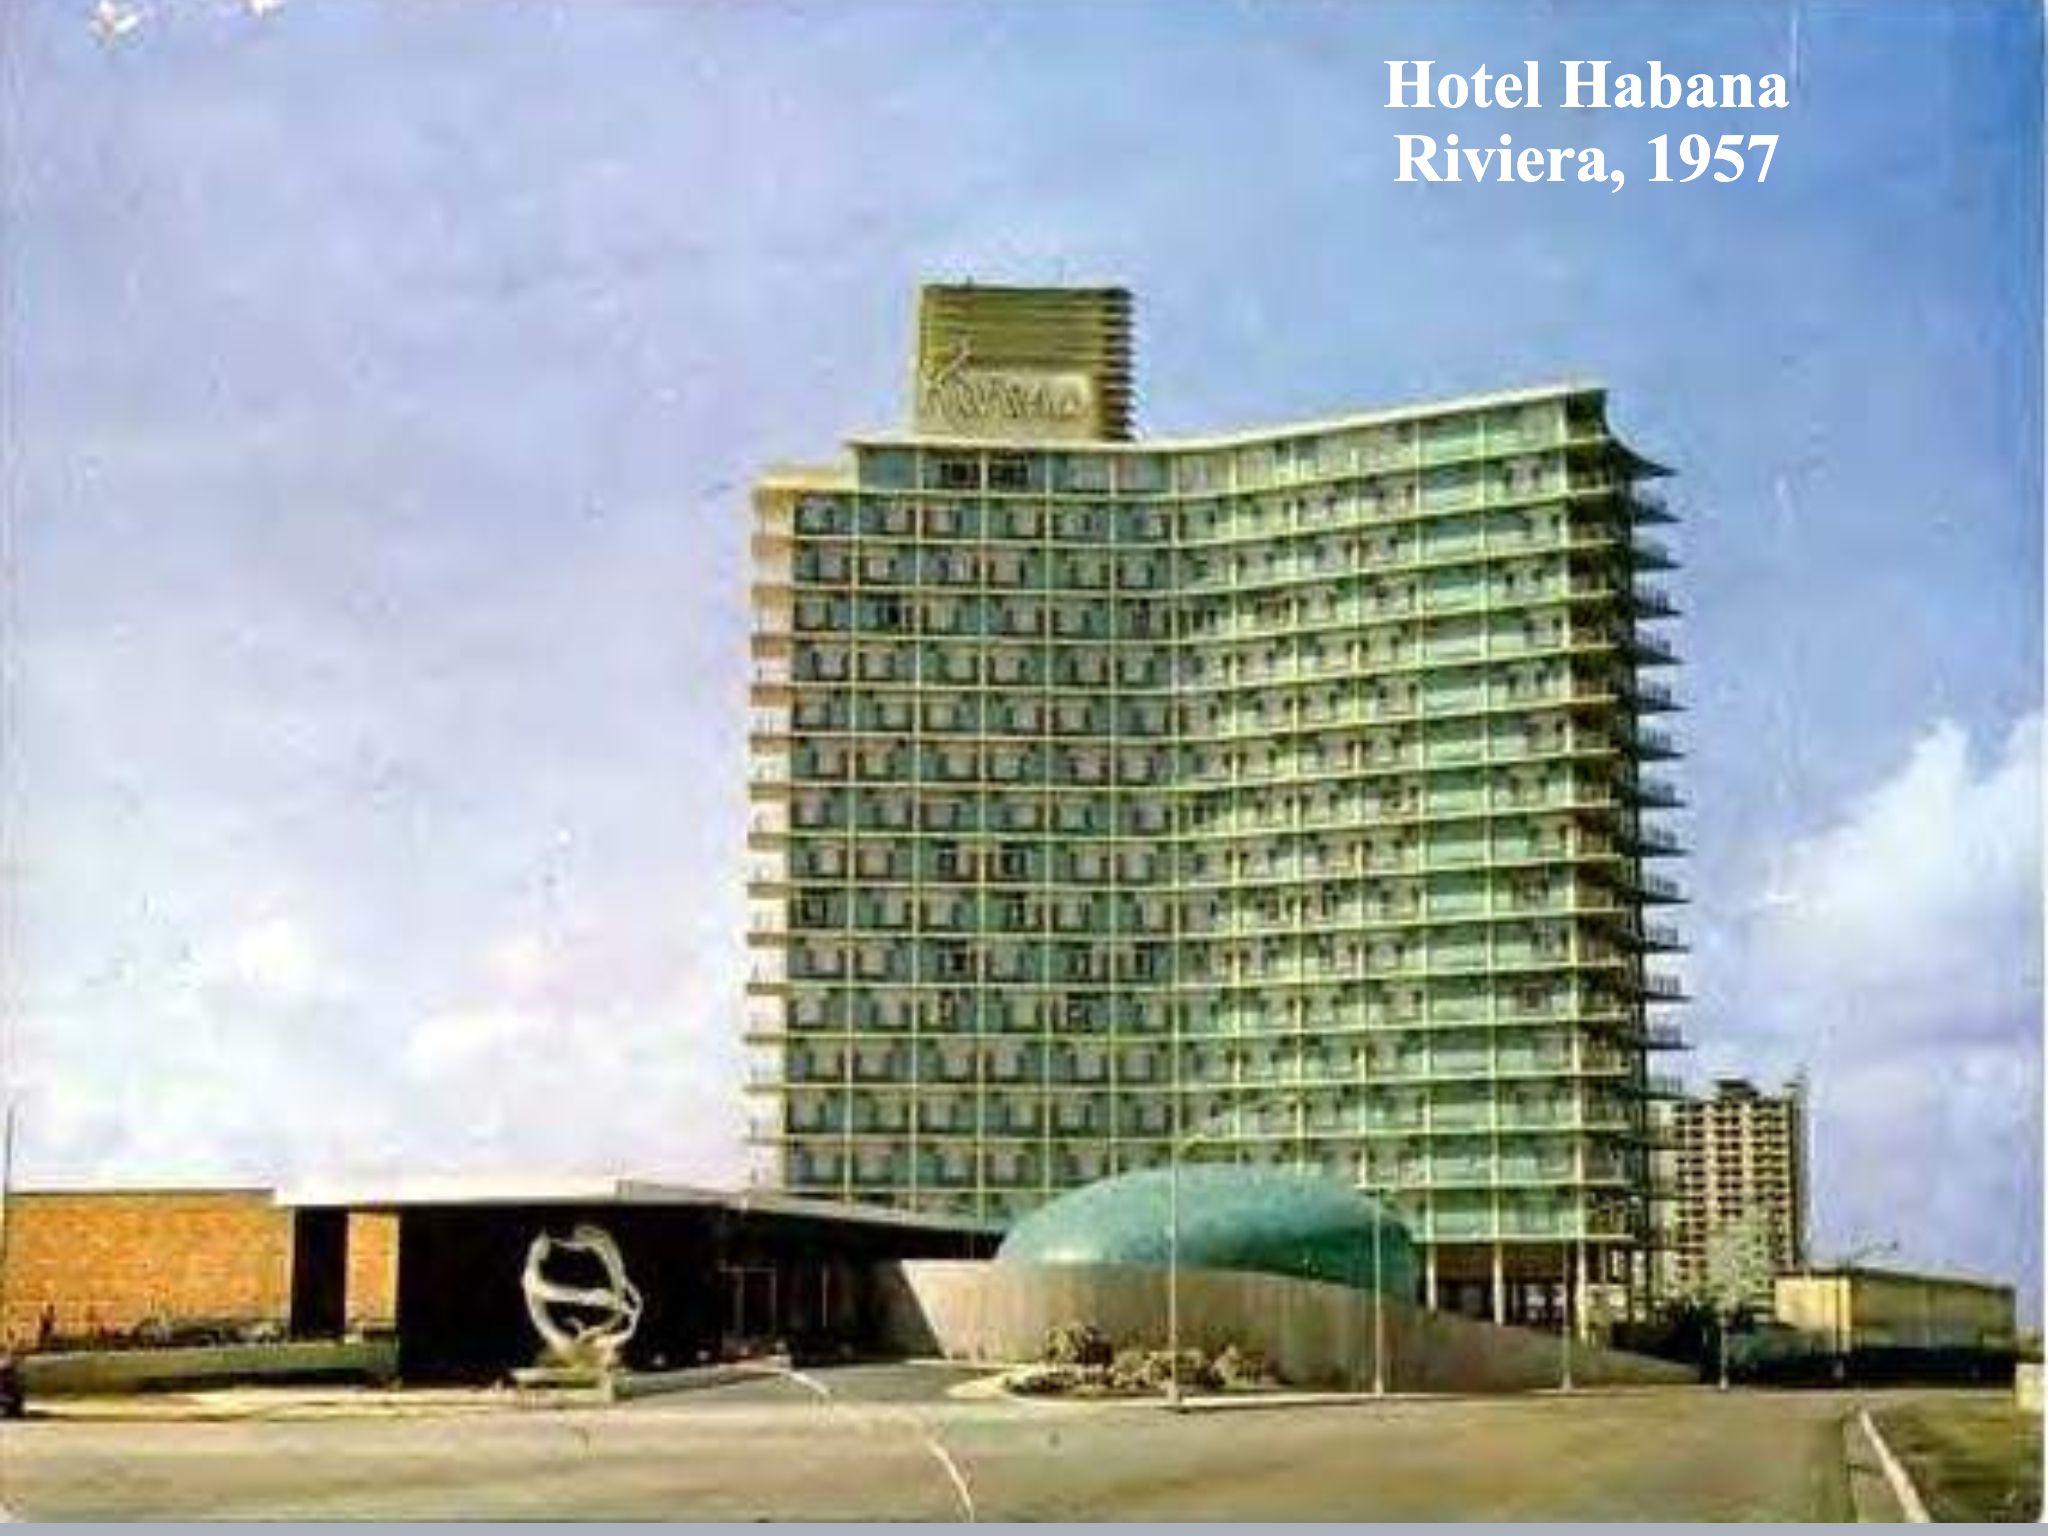 Habana Cuba Hotel Riviera 1957